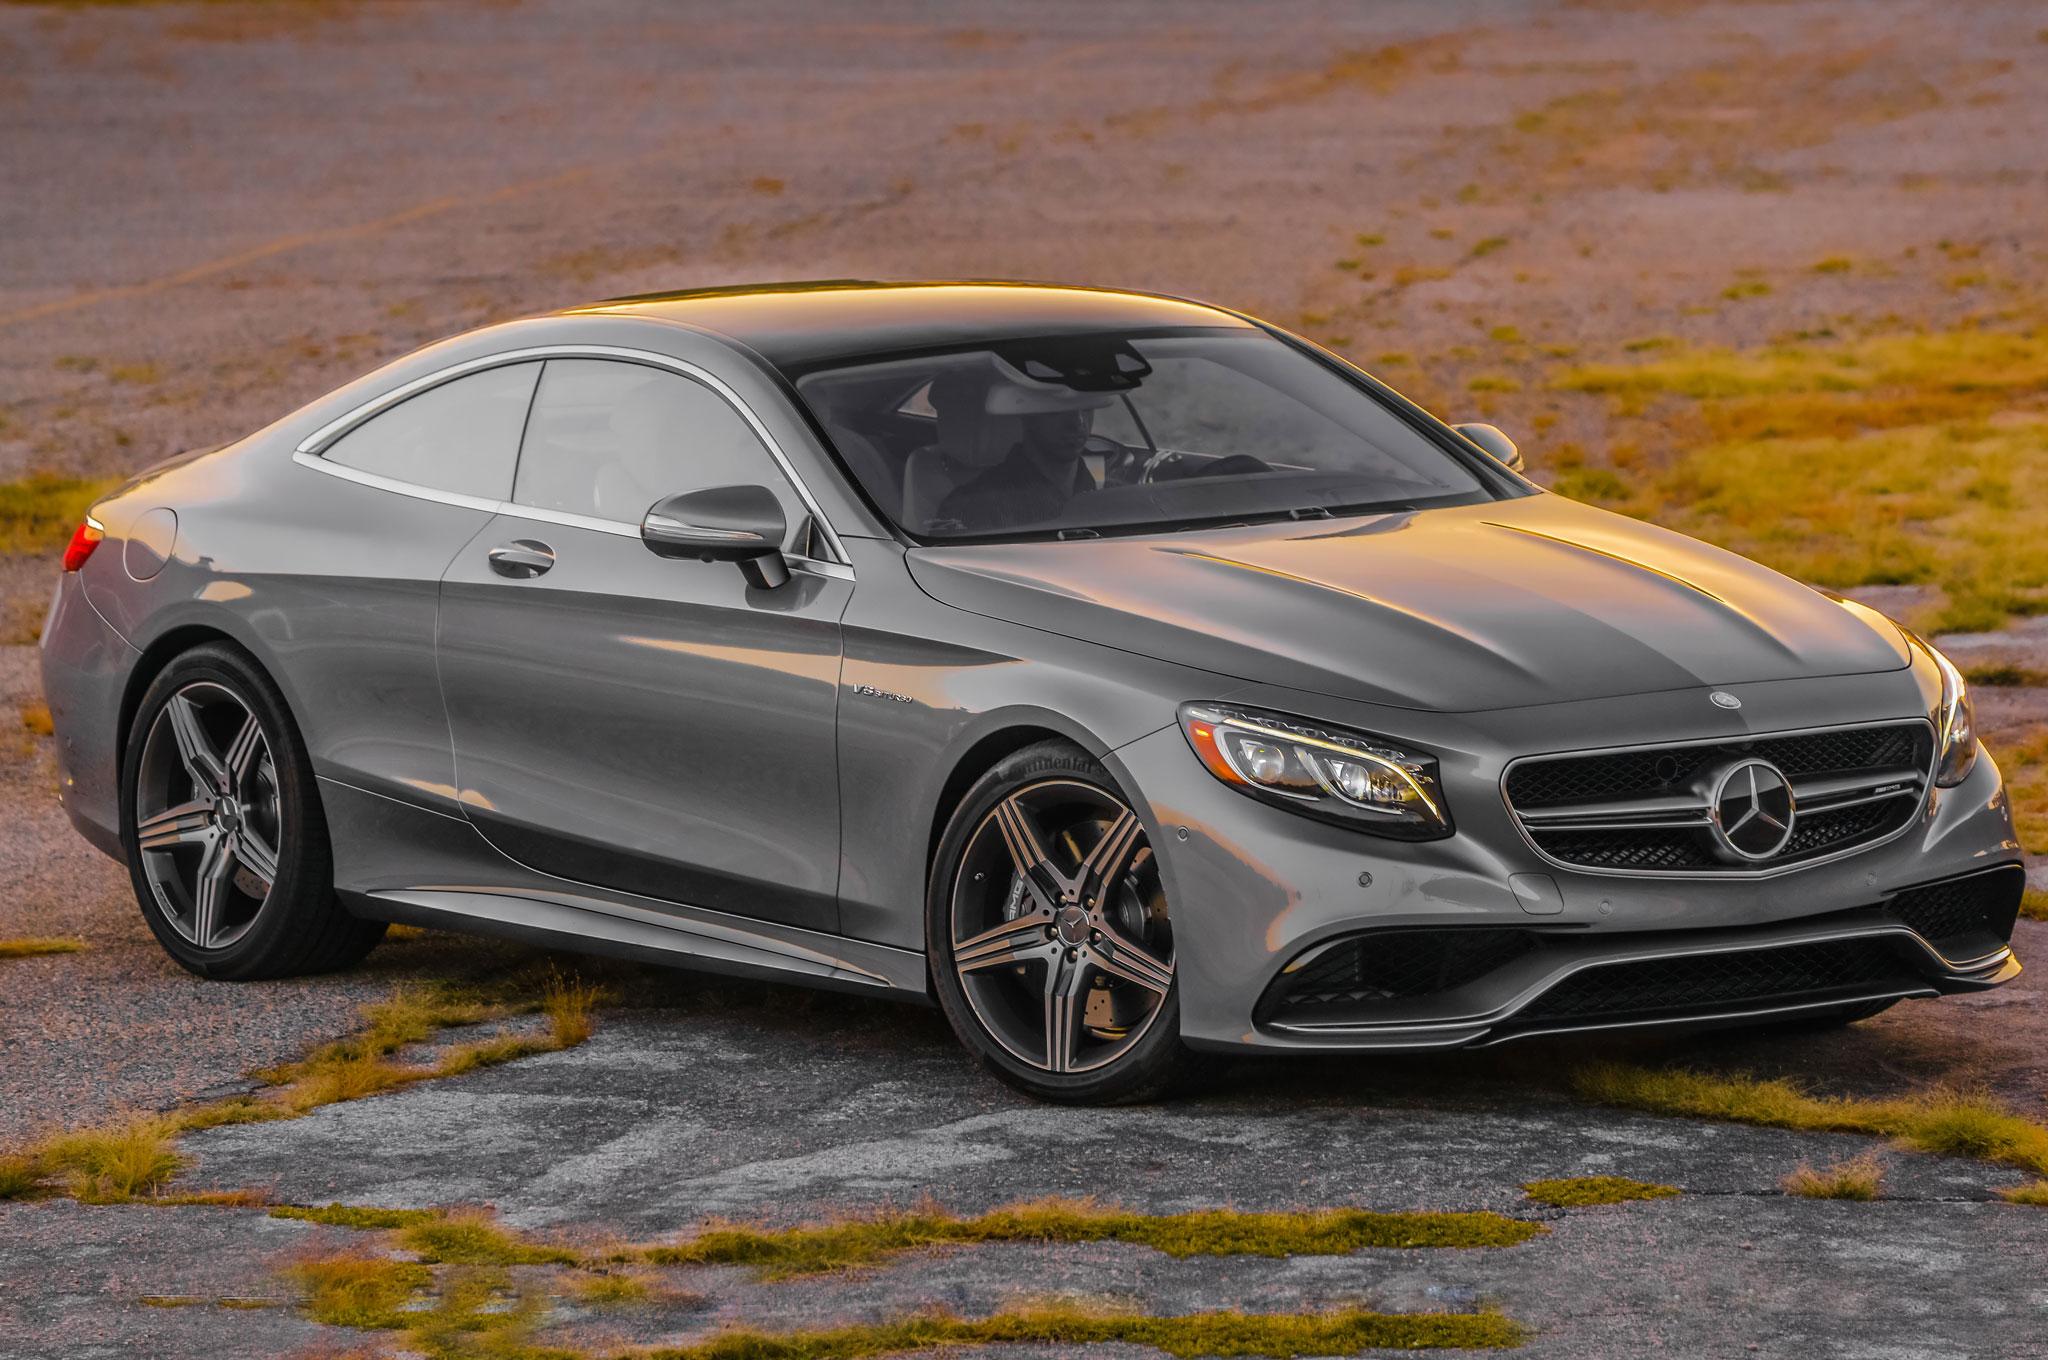 https://st.automobilemag.com/uploads/sites/11/2014/11/2015-Mercedes-Benz-S63-AMG-coupe-front-three-quarter-view.jpg